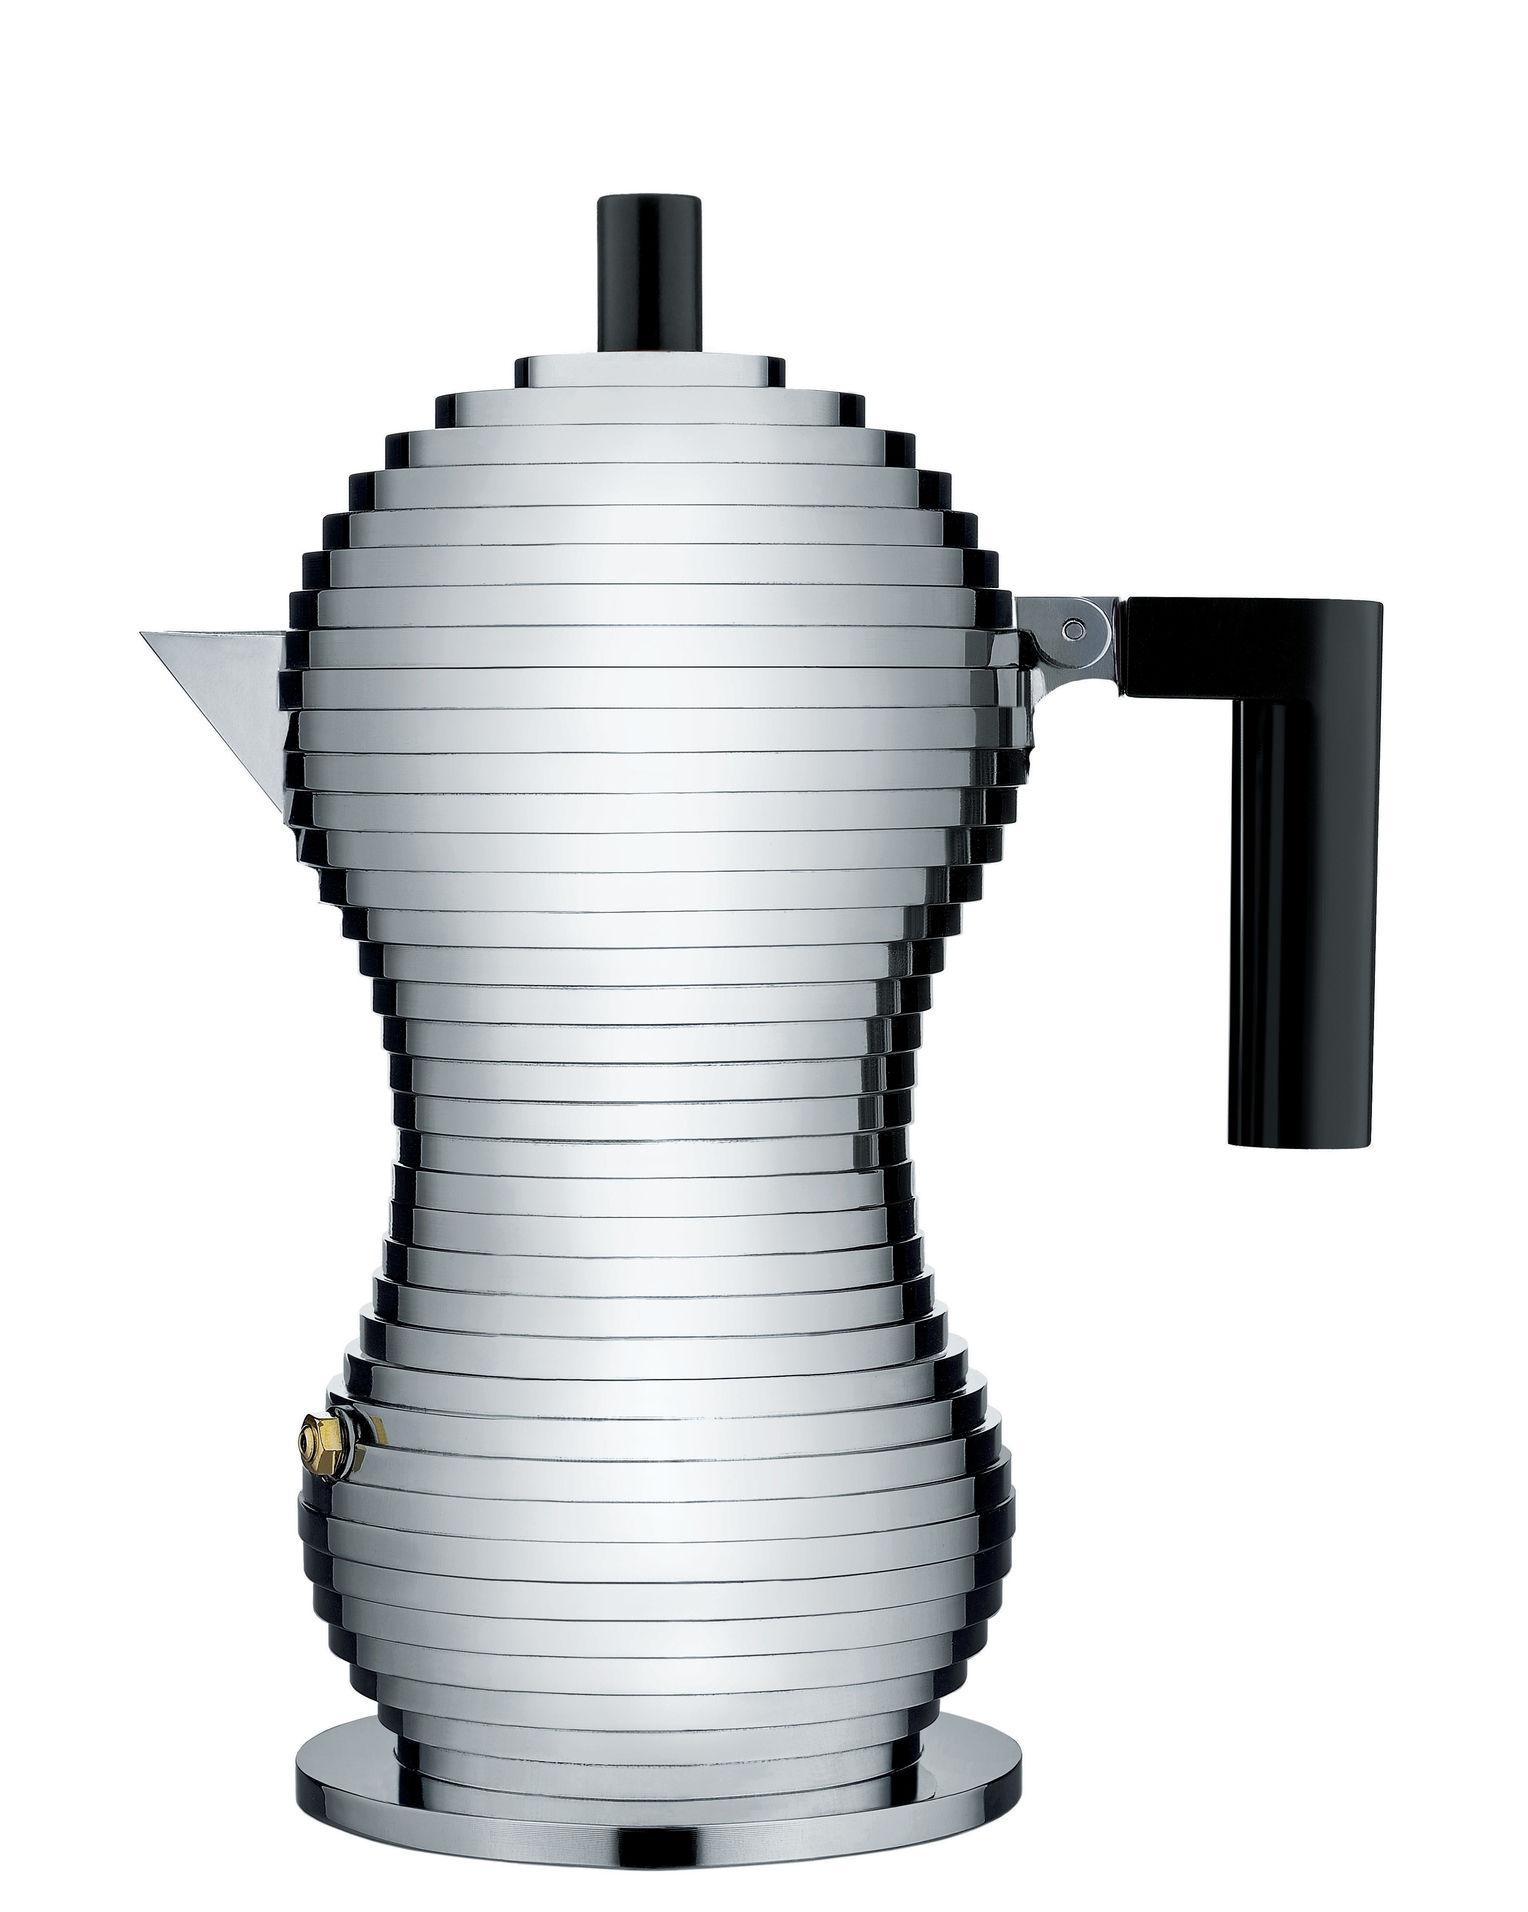 cafeti re italienne pulcina 3 tasses chrom noir alessi. Black Bedroom Furniture Sets. Home Design Ideas